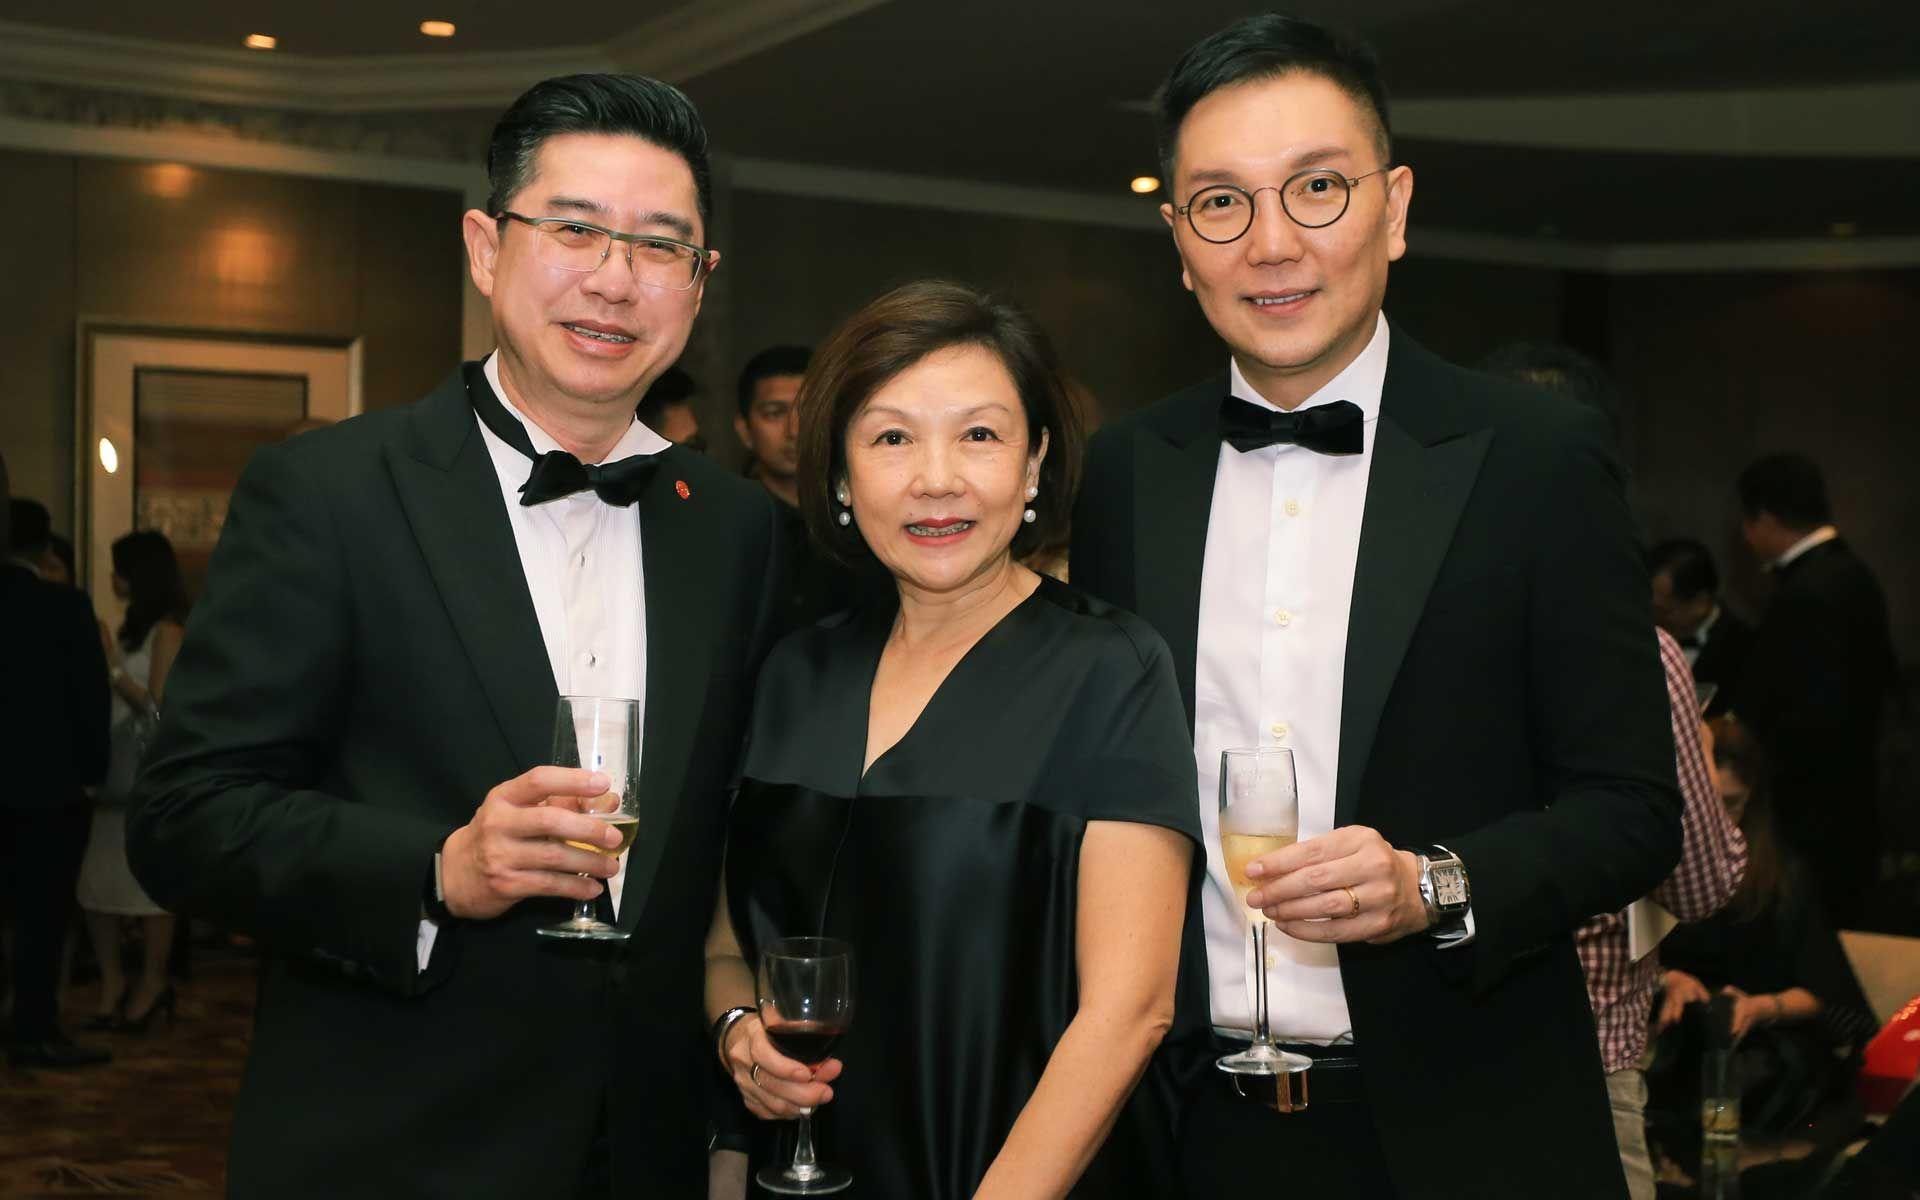 Raymond Teo, Chung Tze May and Jamie Ong